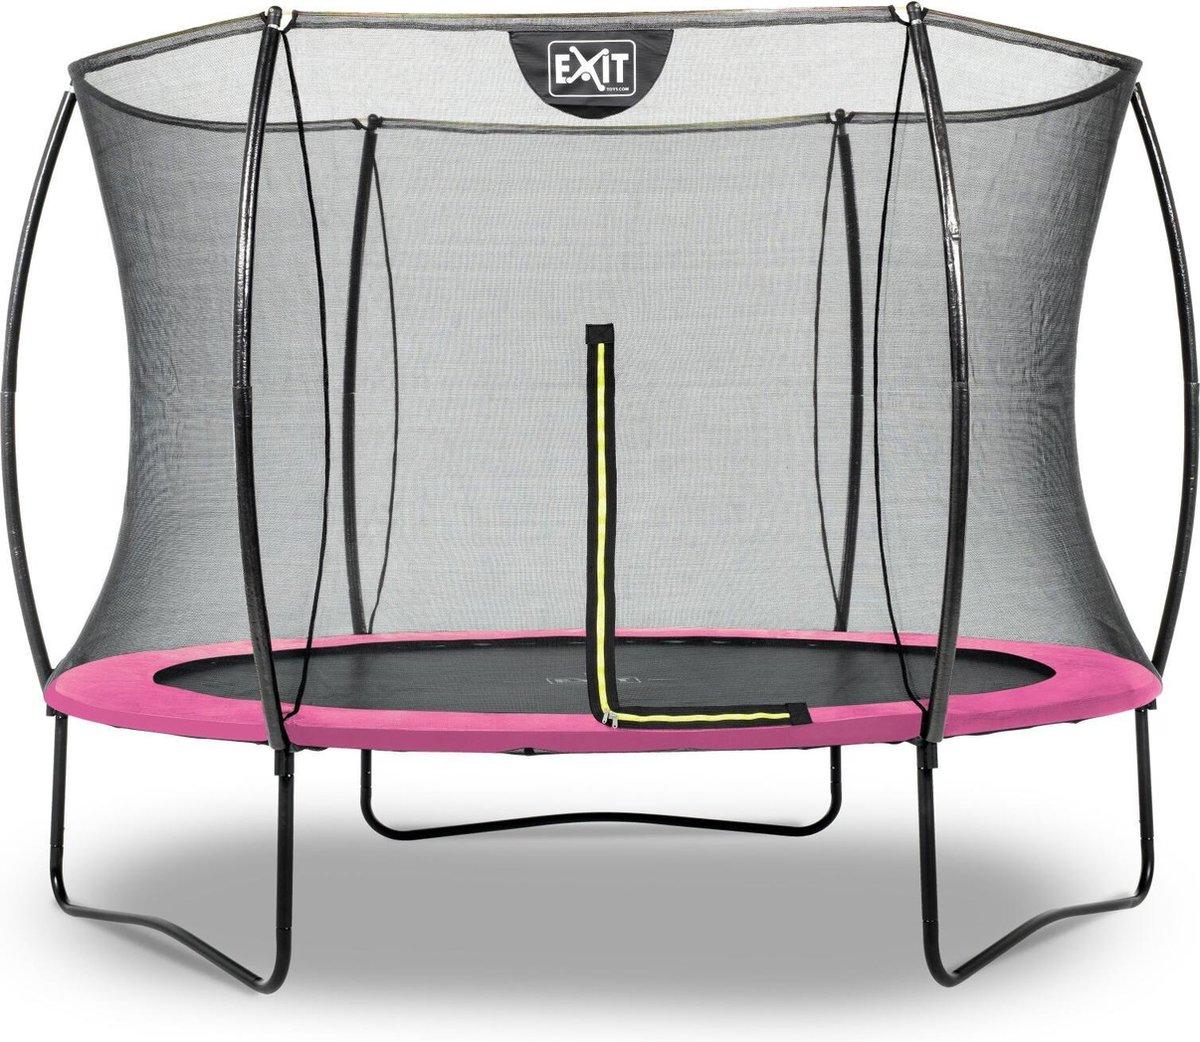 Trampoline EXIT Silhouette - ø244cm - roze